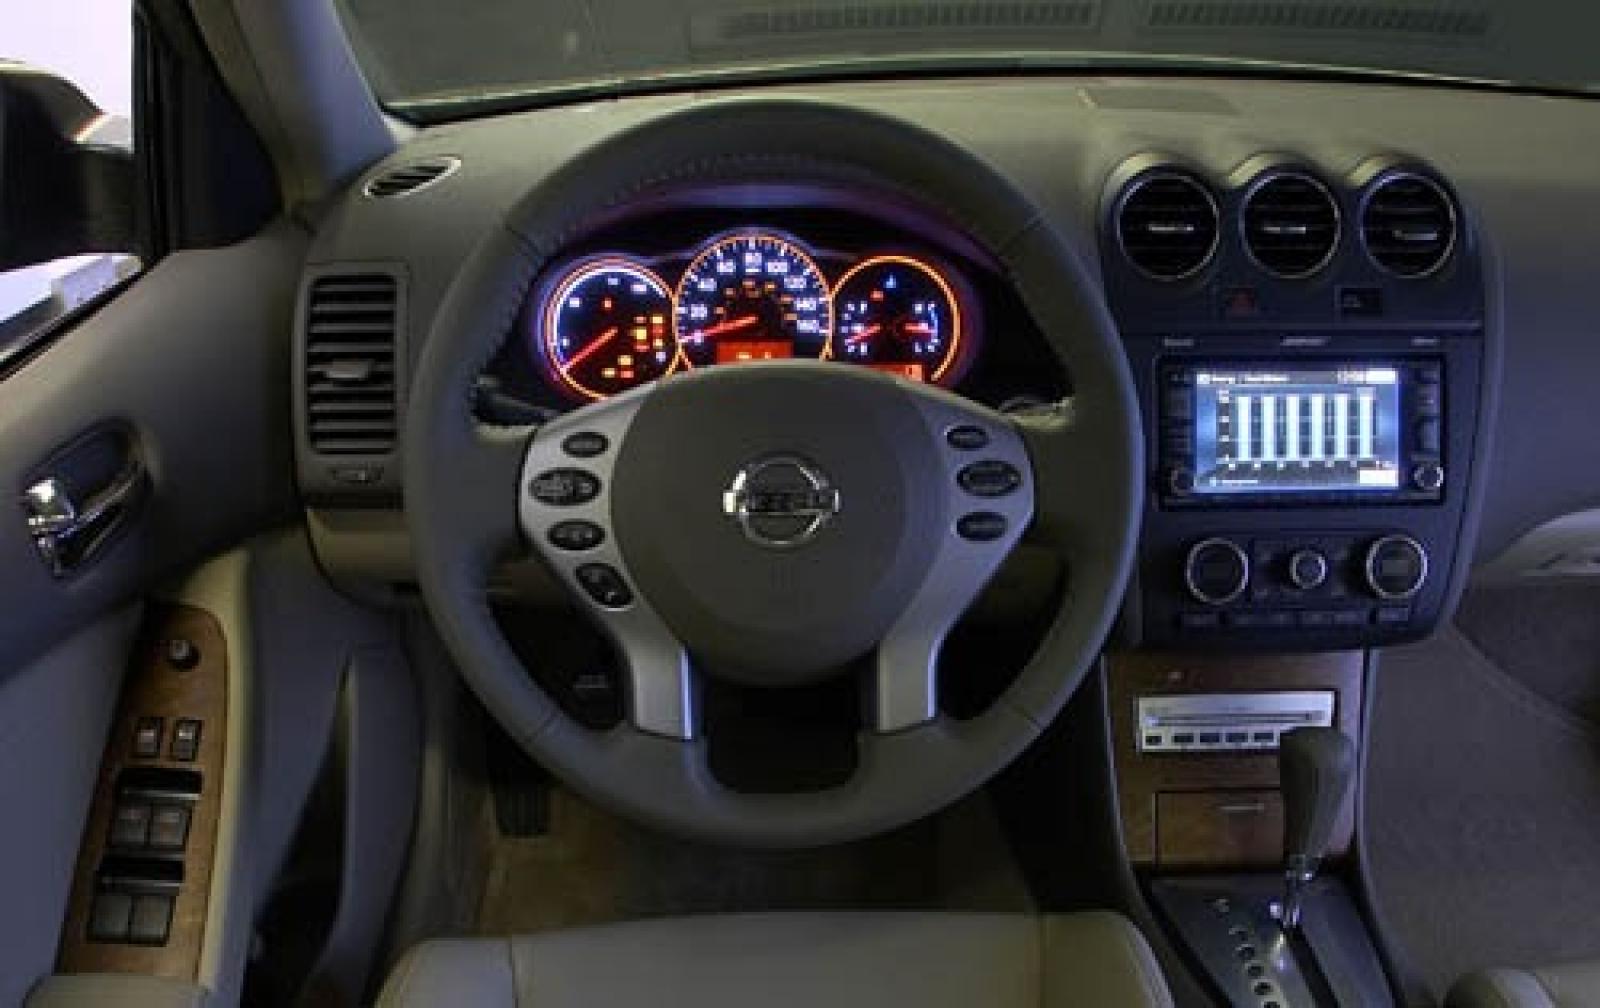 2007 Nissan Altima Hybrid Exterior 6 800 1024 1280 1600 Origin